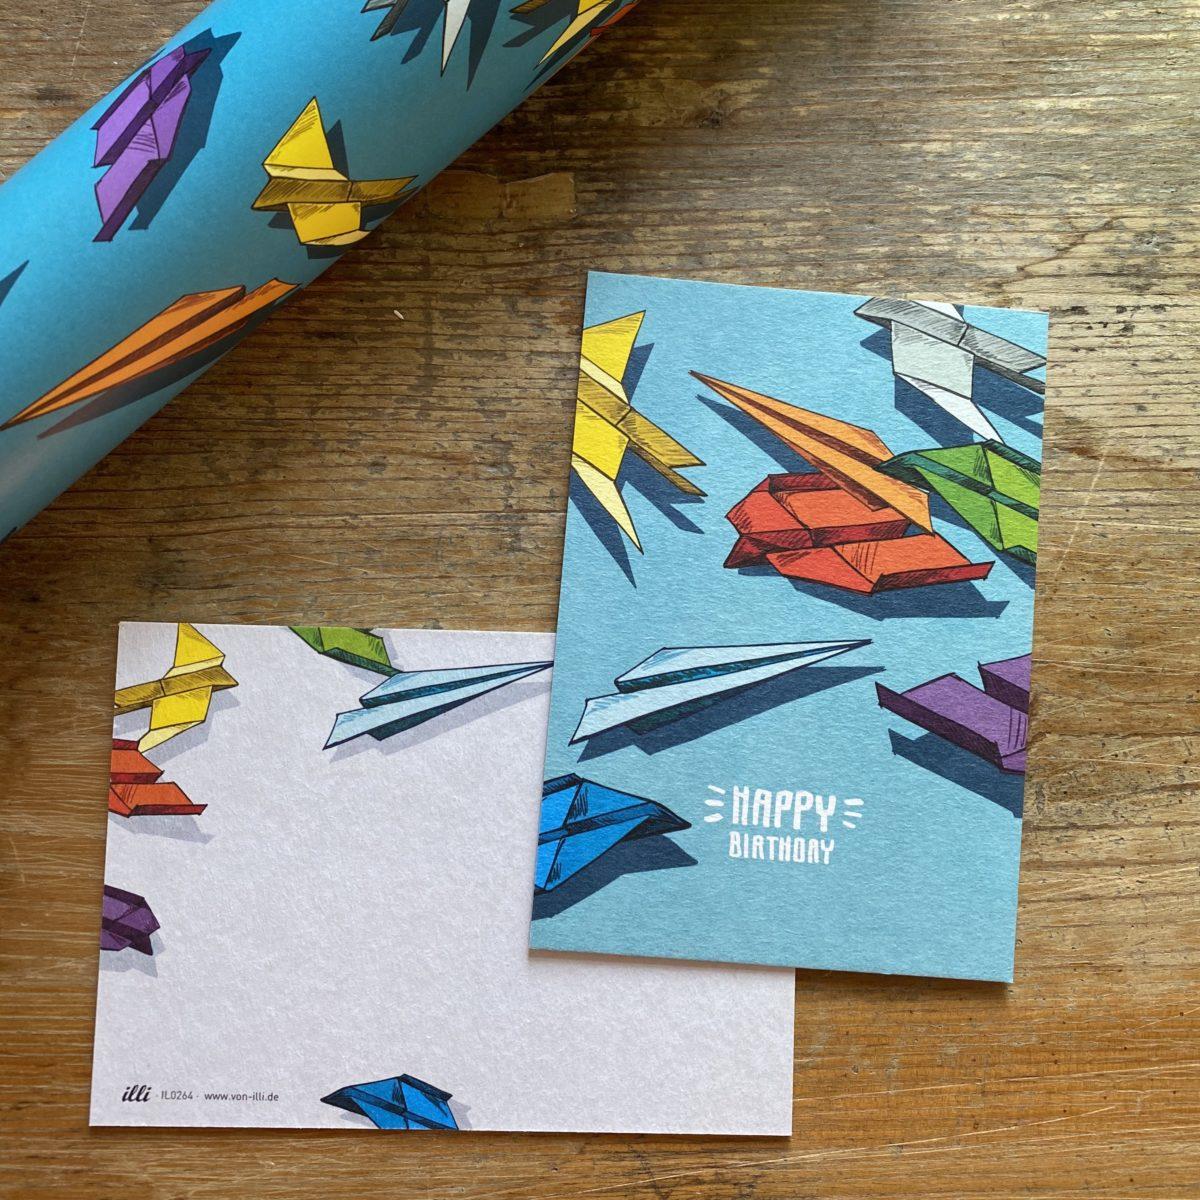 KYUTE Postkarte von illi MIO